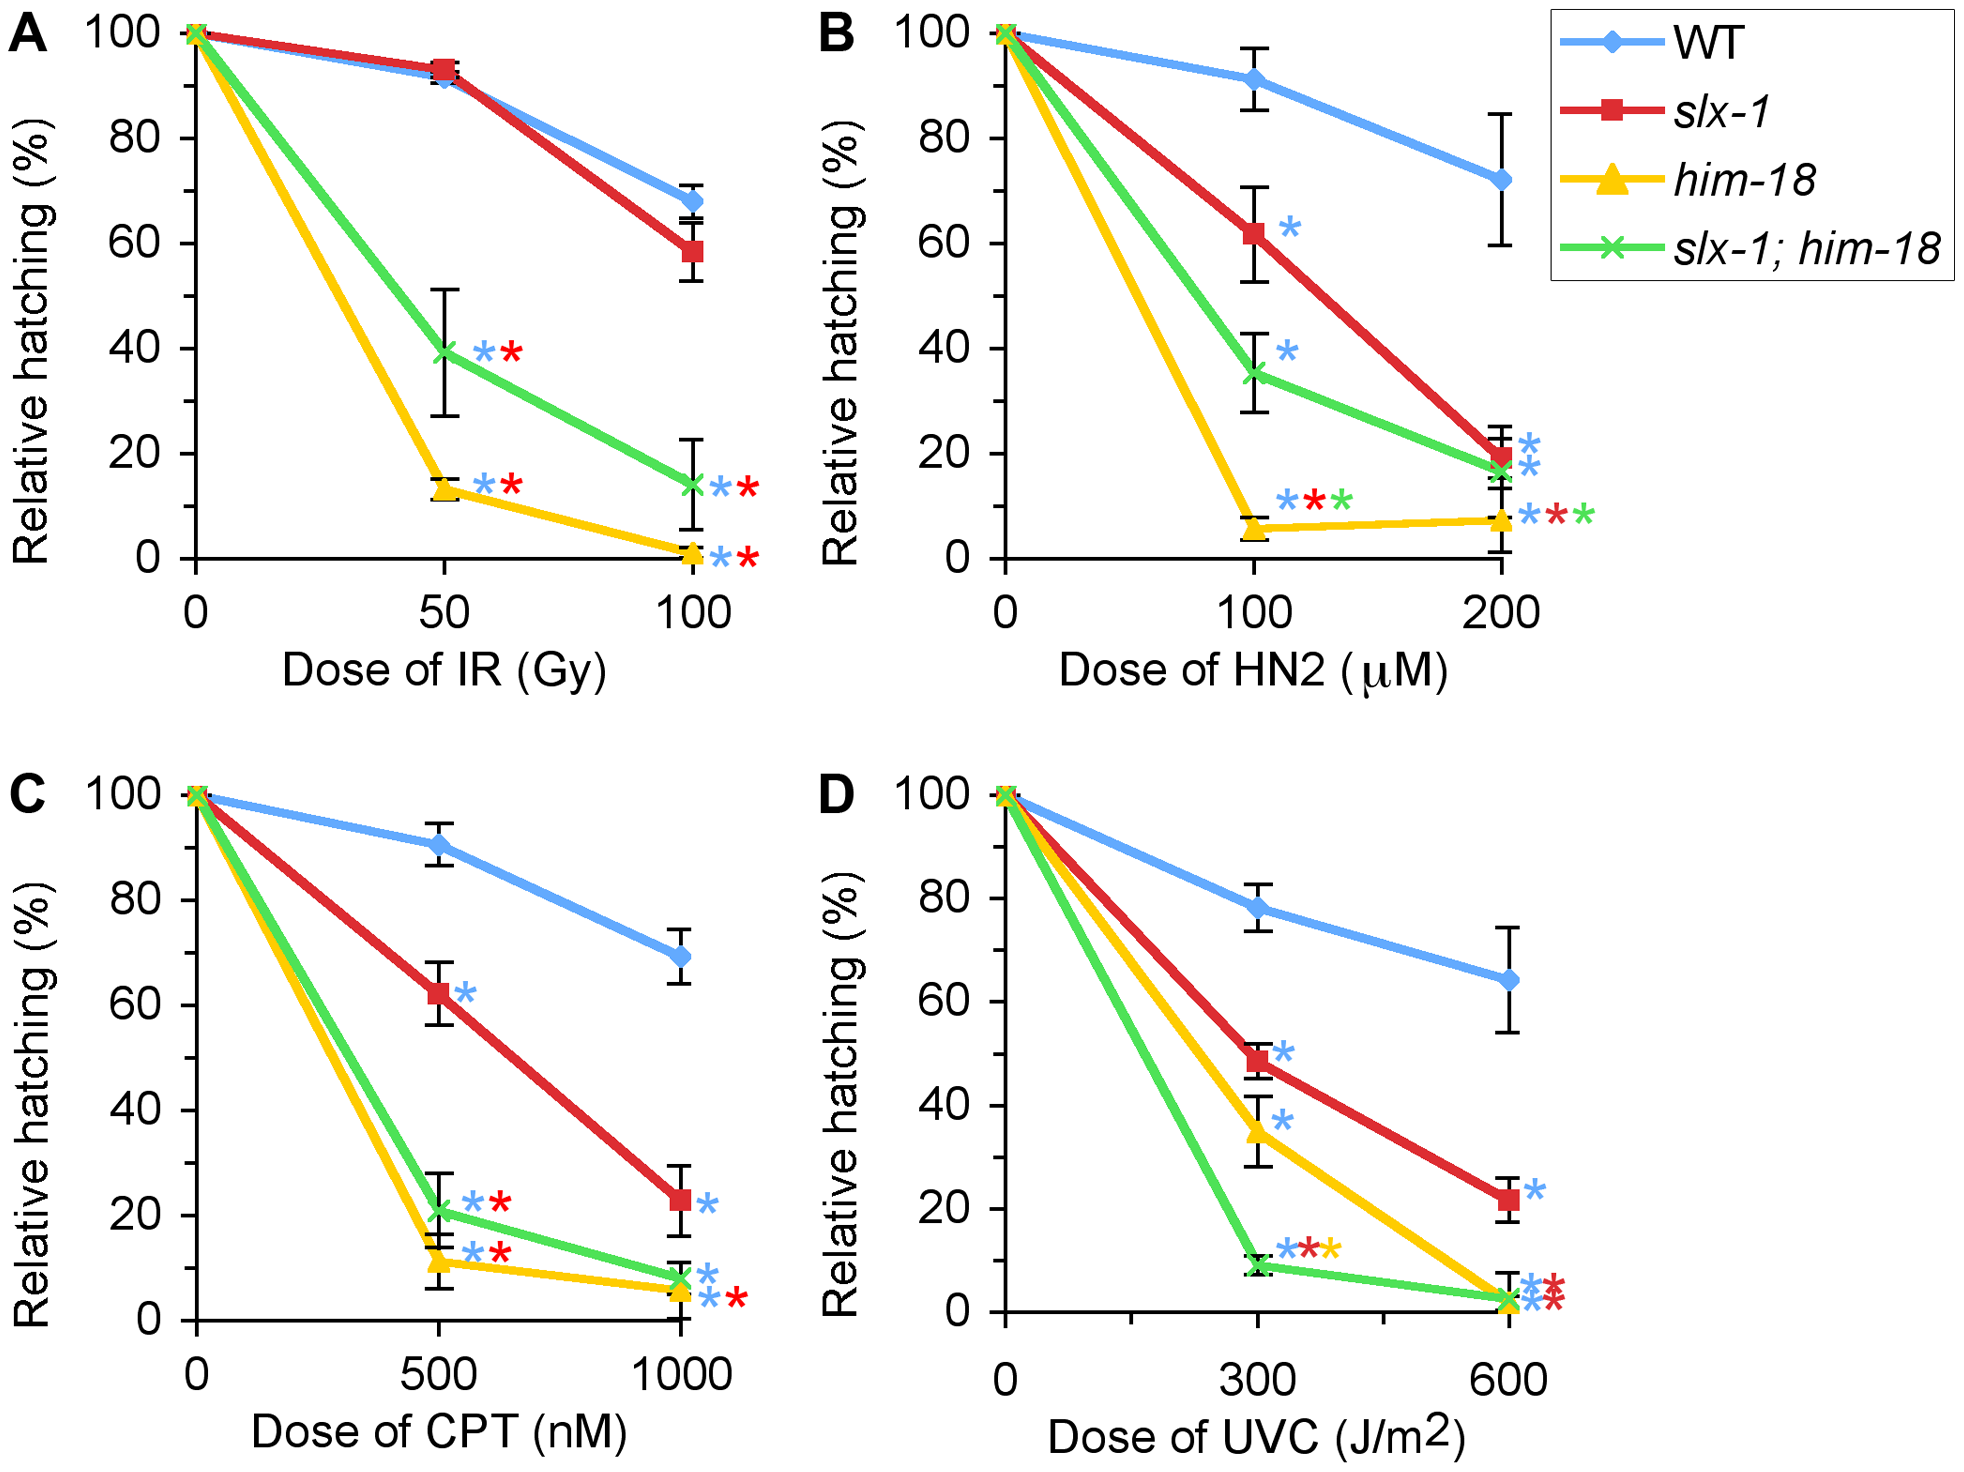 <i>slx-1</i> mutants exhibit hypersensitivity to nitrogen mustard, camptothecin, and ultraviolet C, but not ionizing radiation.